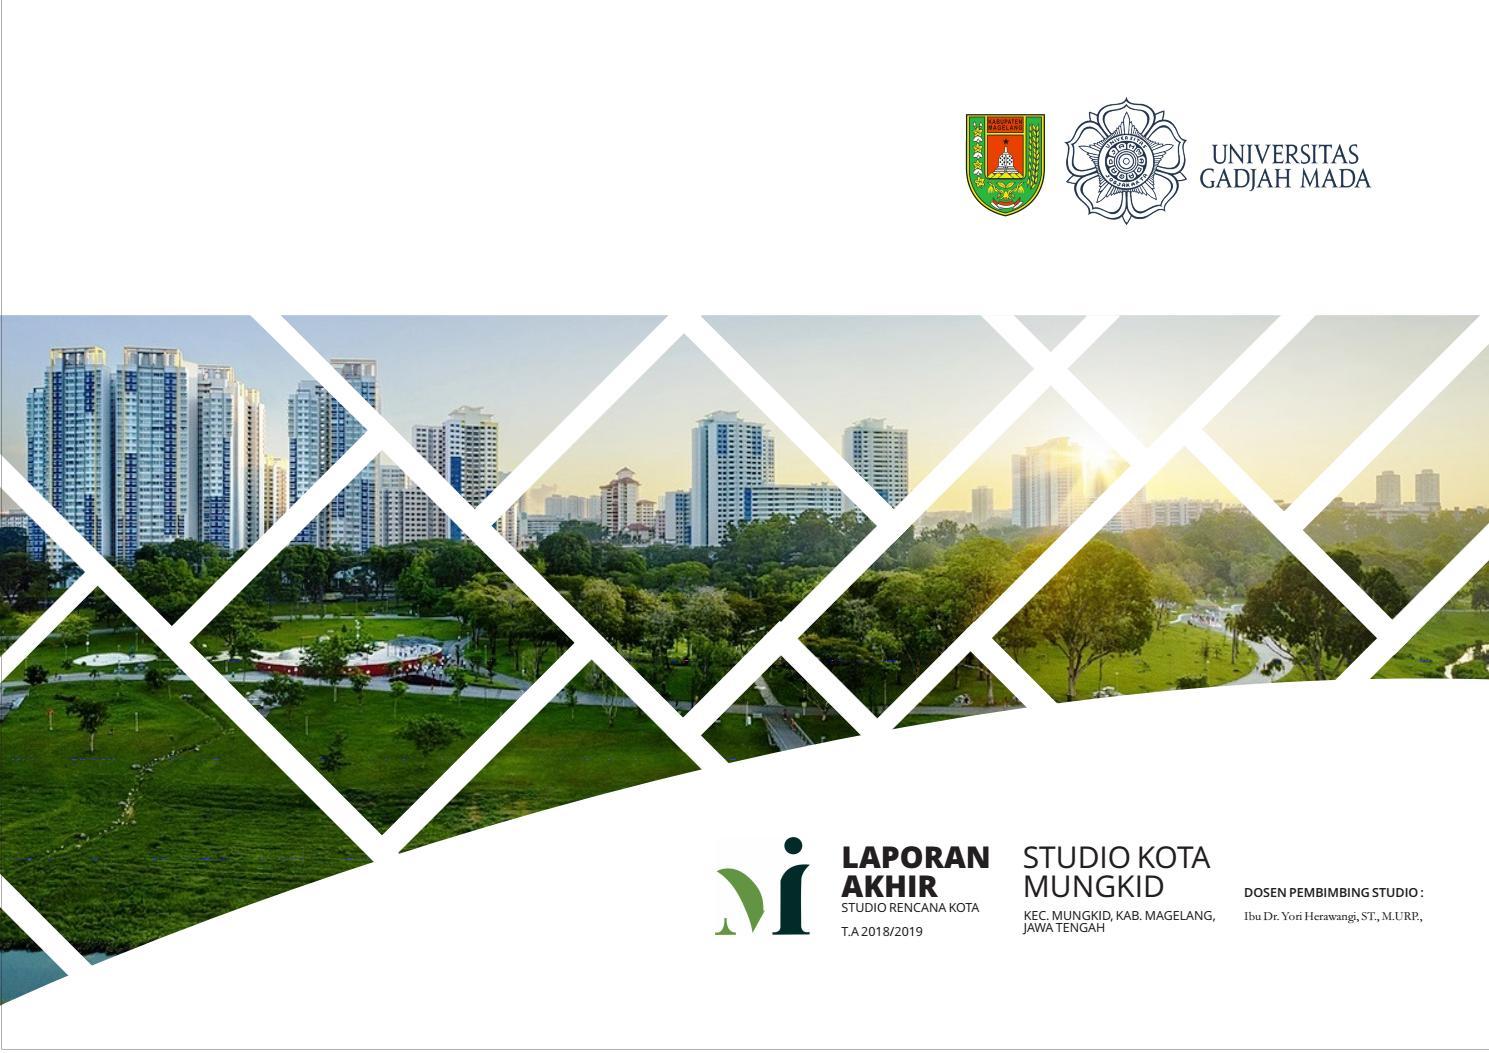 Laporan Akhir Rencana Studio Kota Mungkid By Naufal Habib Issuu